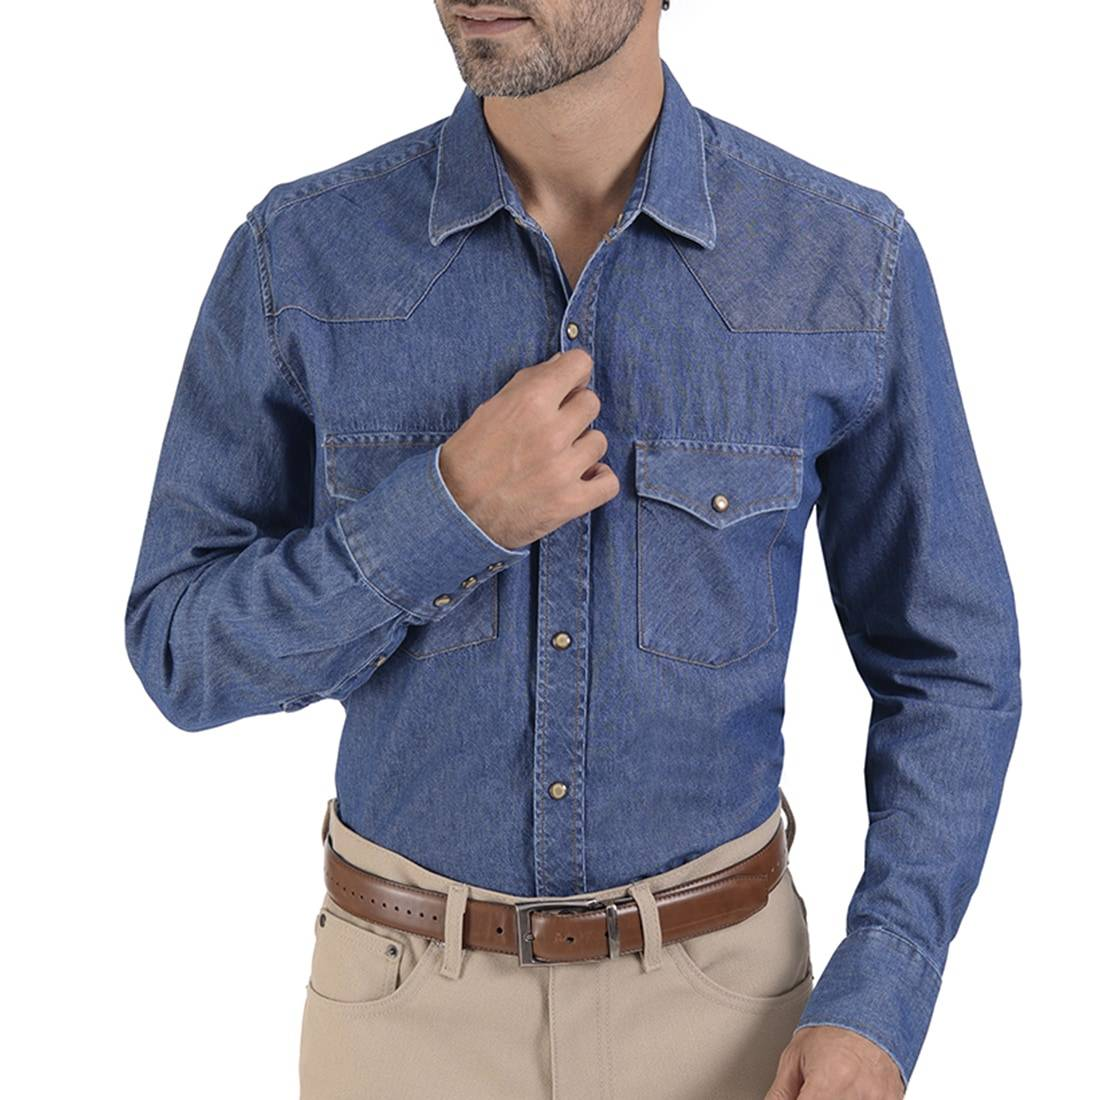 041941571718-01-Camisa-Vaquera-Mezcliia-Classic-Fit-Stone-Bleach-yale